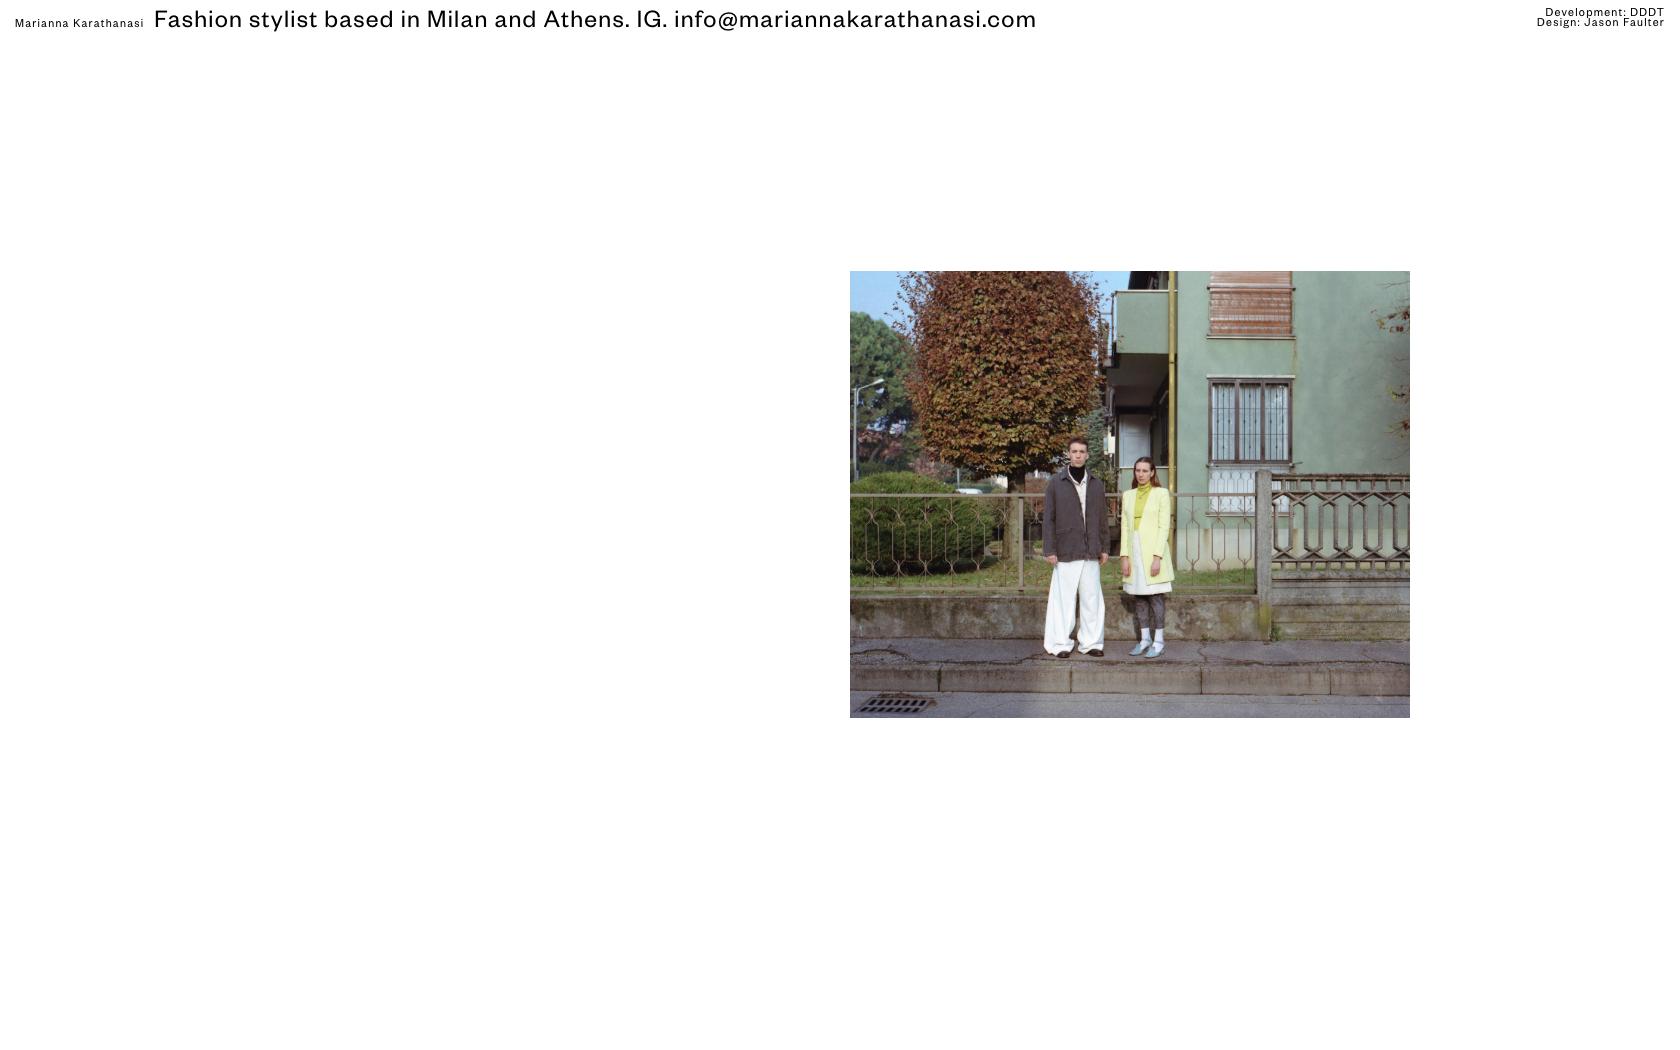 • Marianna Karathanasi – Website 0